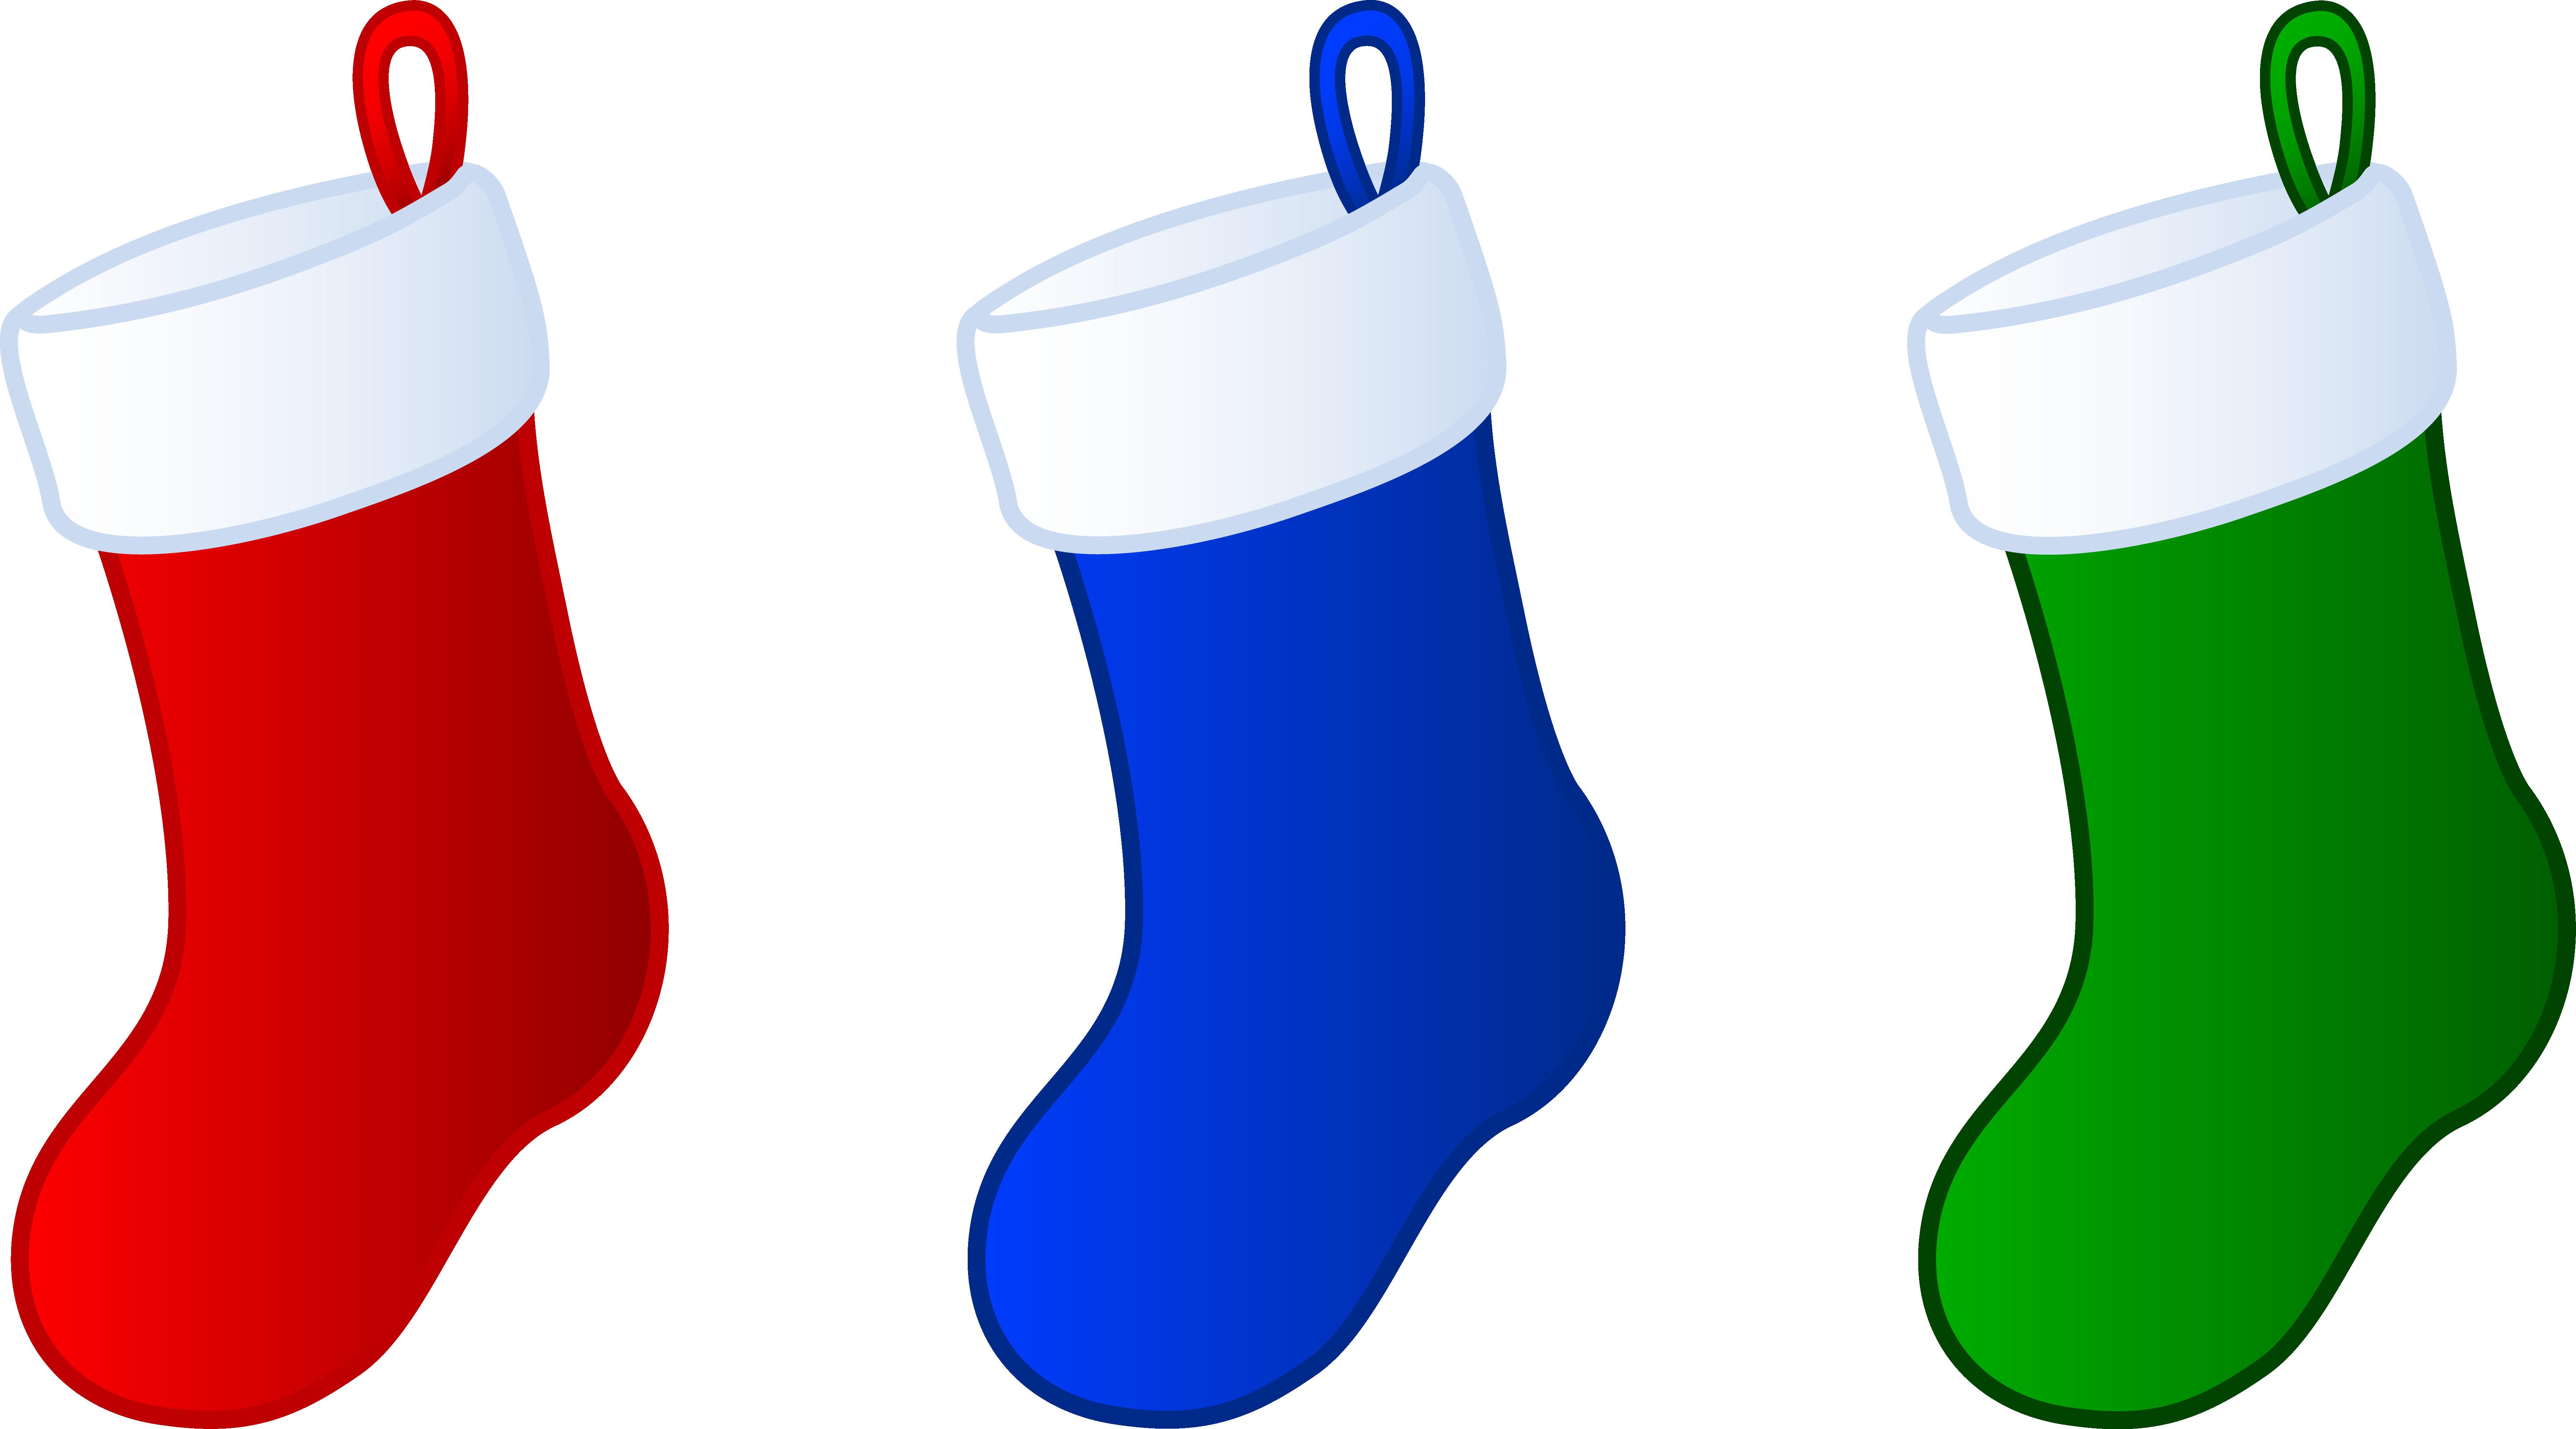 7198x3992 Three Simple Christmas Stockings Free Clip Art Extraordinary